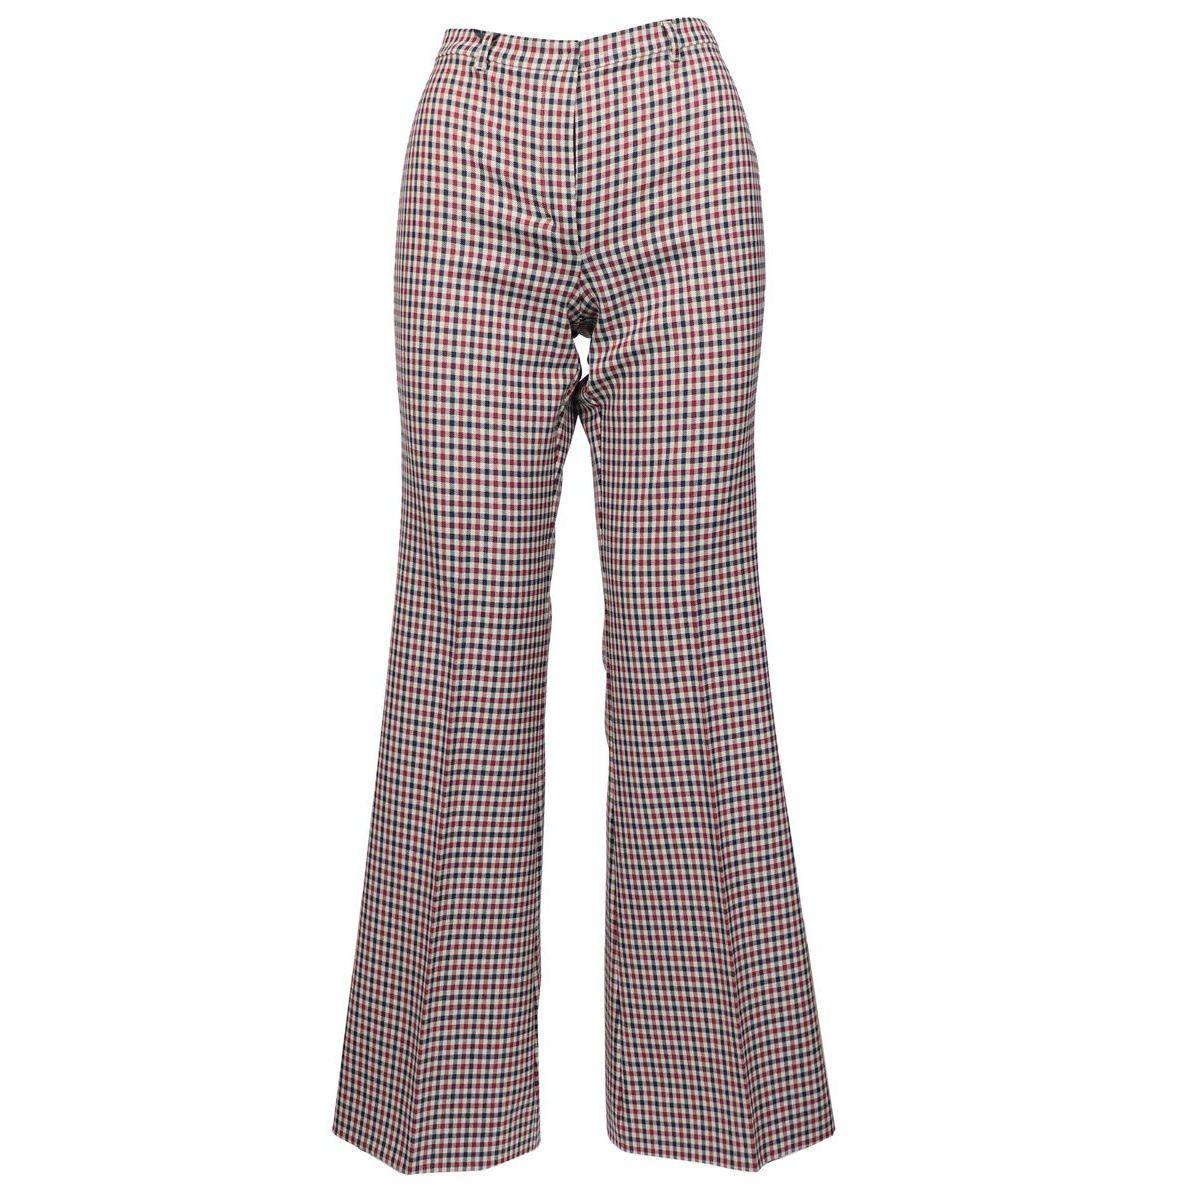 SORAIA stretch trousers Blue / burgundy Max Mara